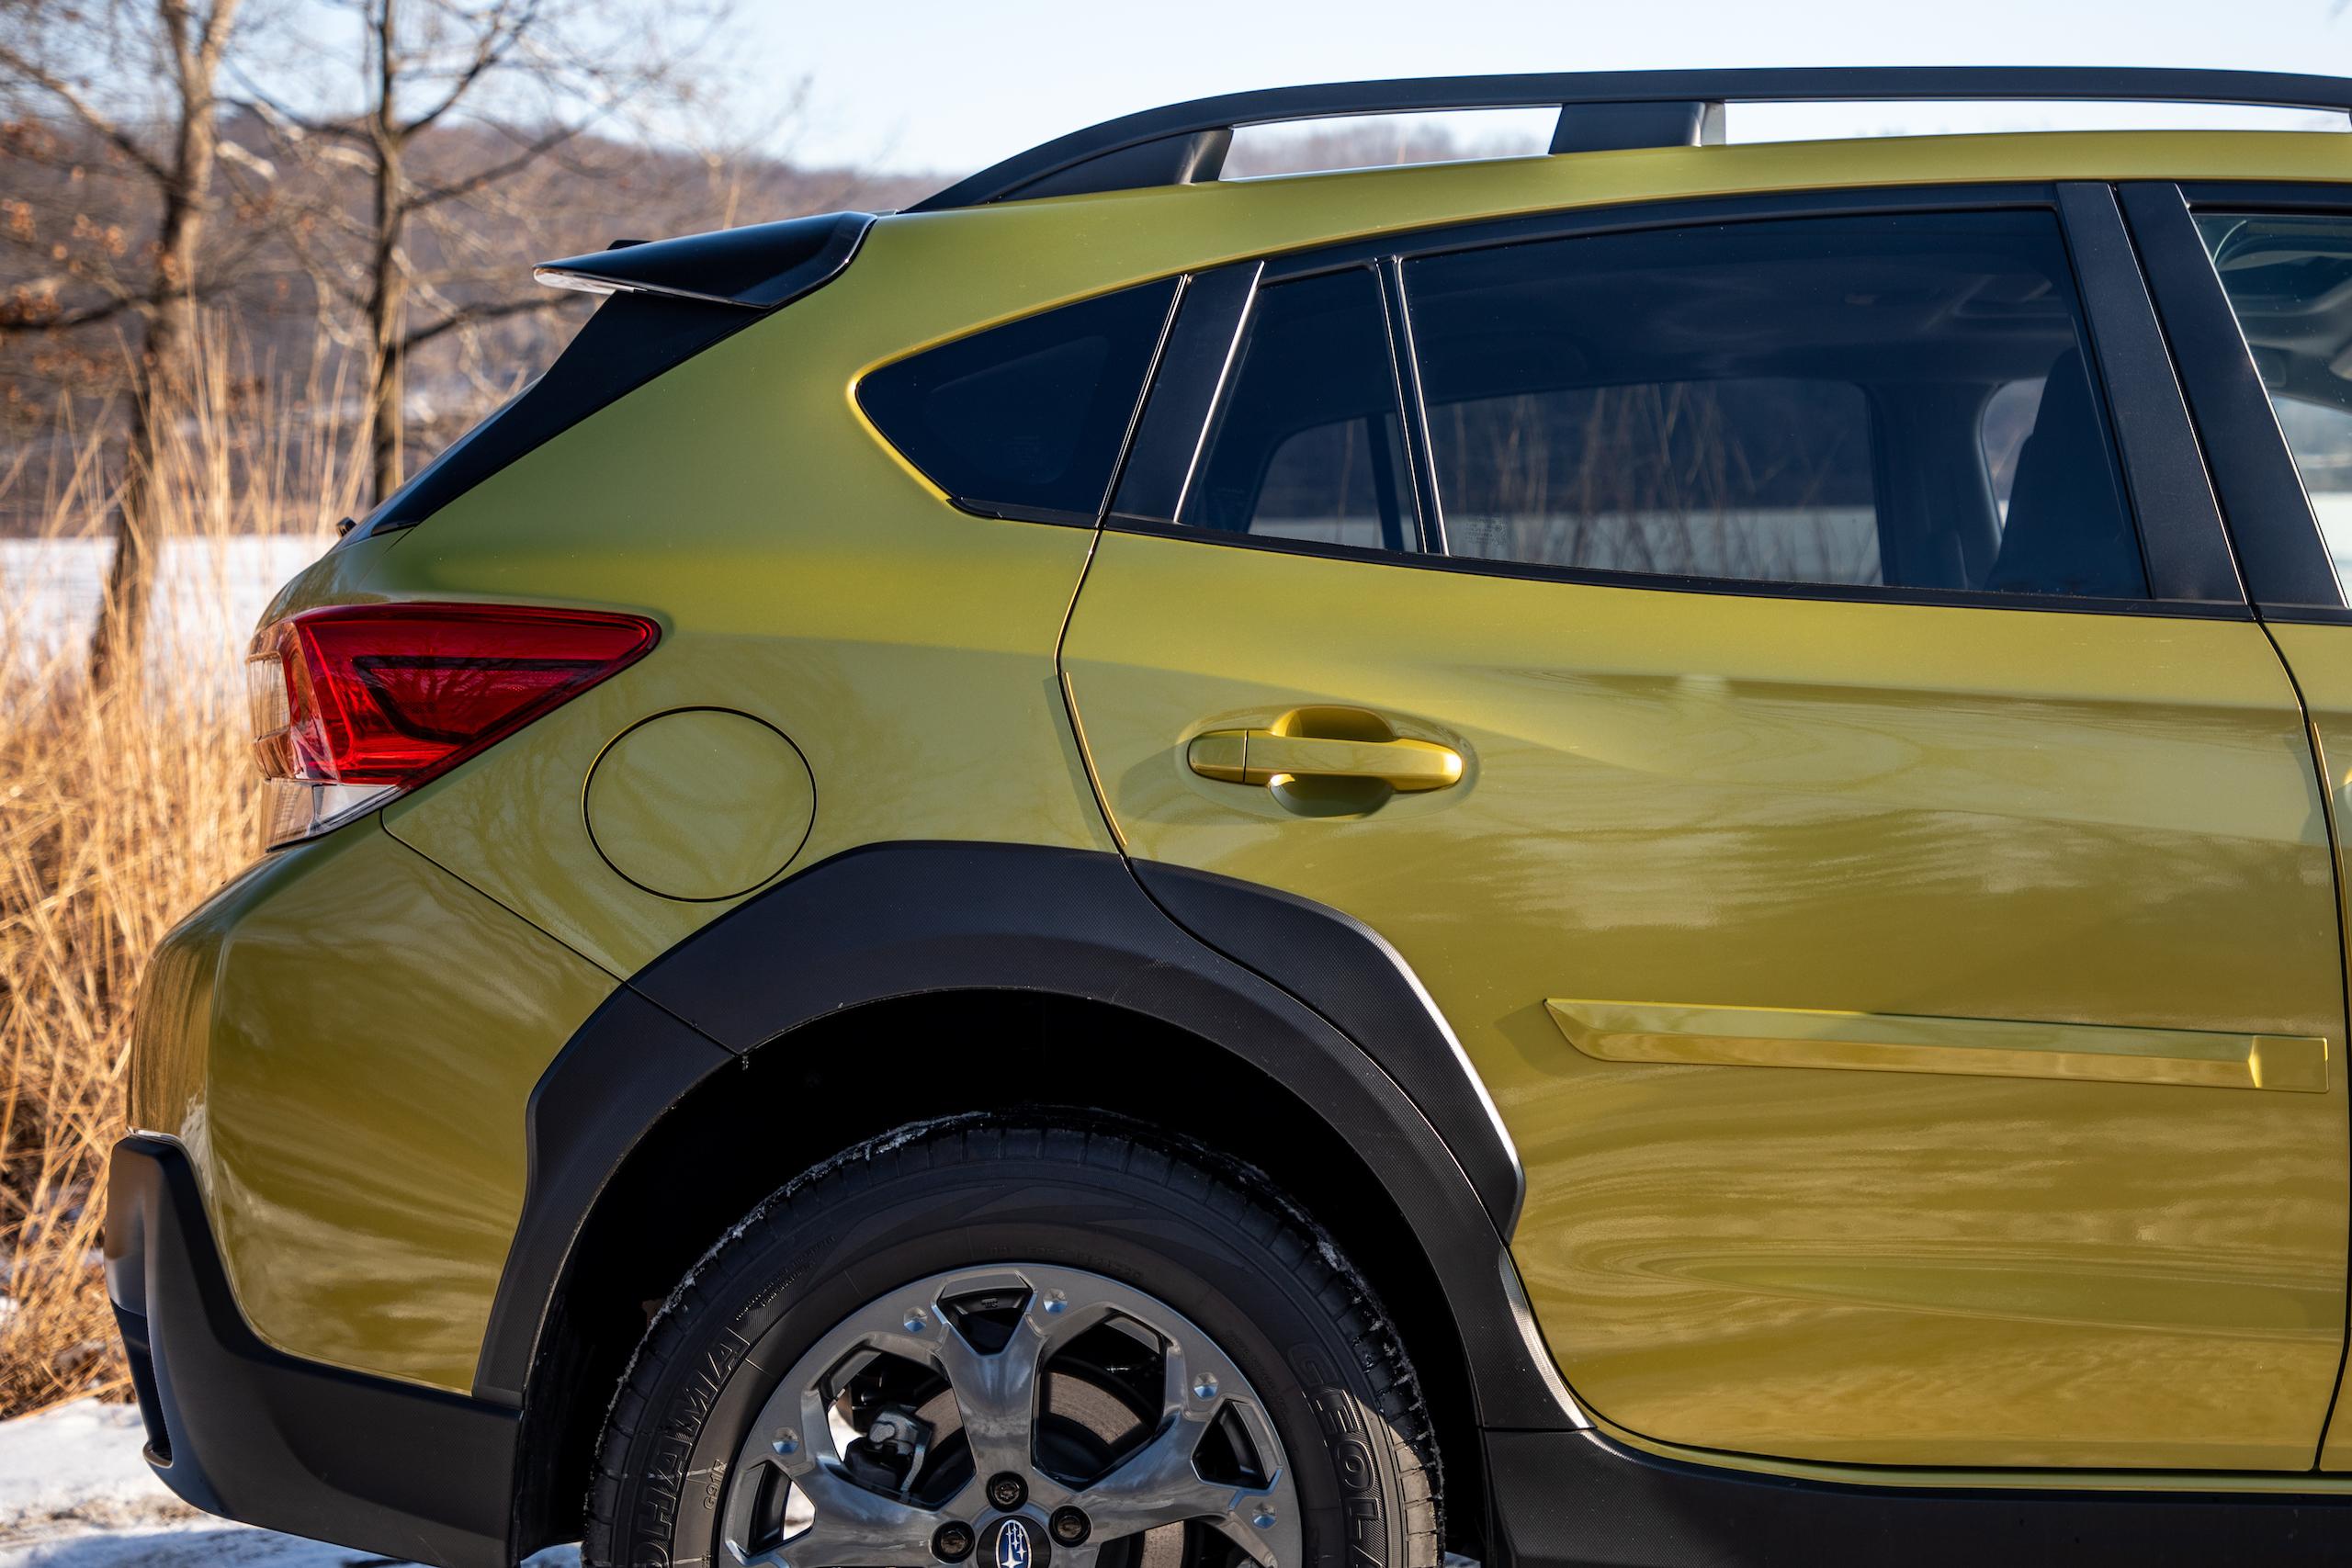 Subaru Crosstrek Sport rear quarter and door side profile